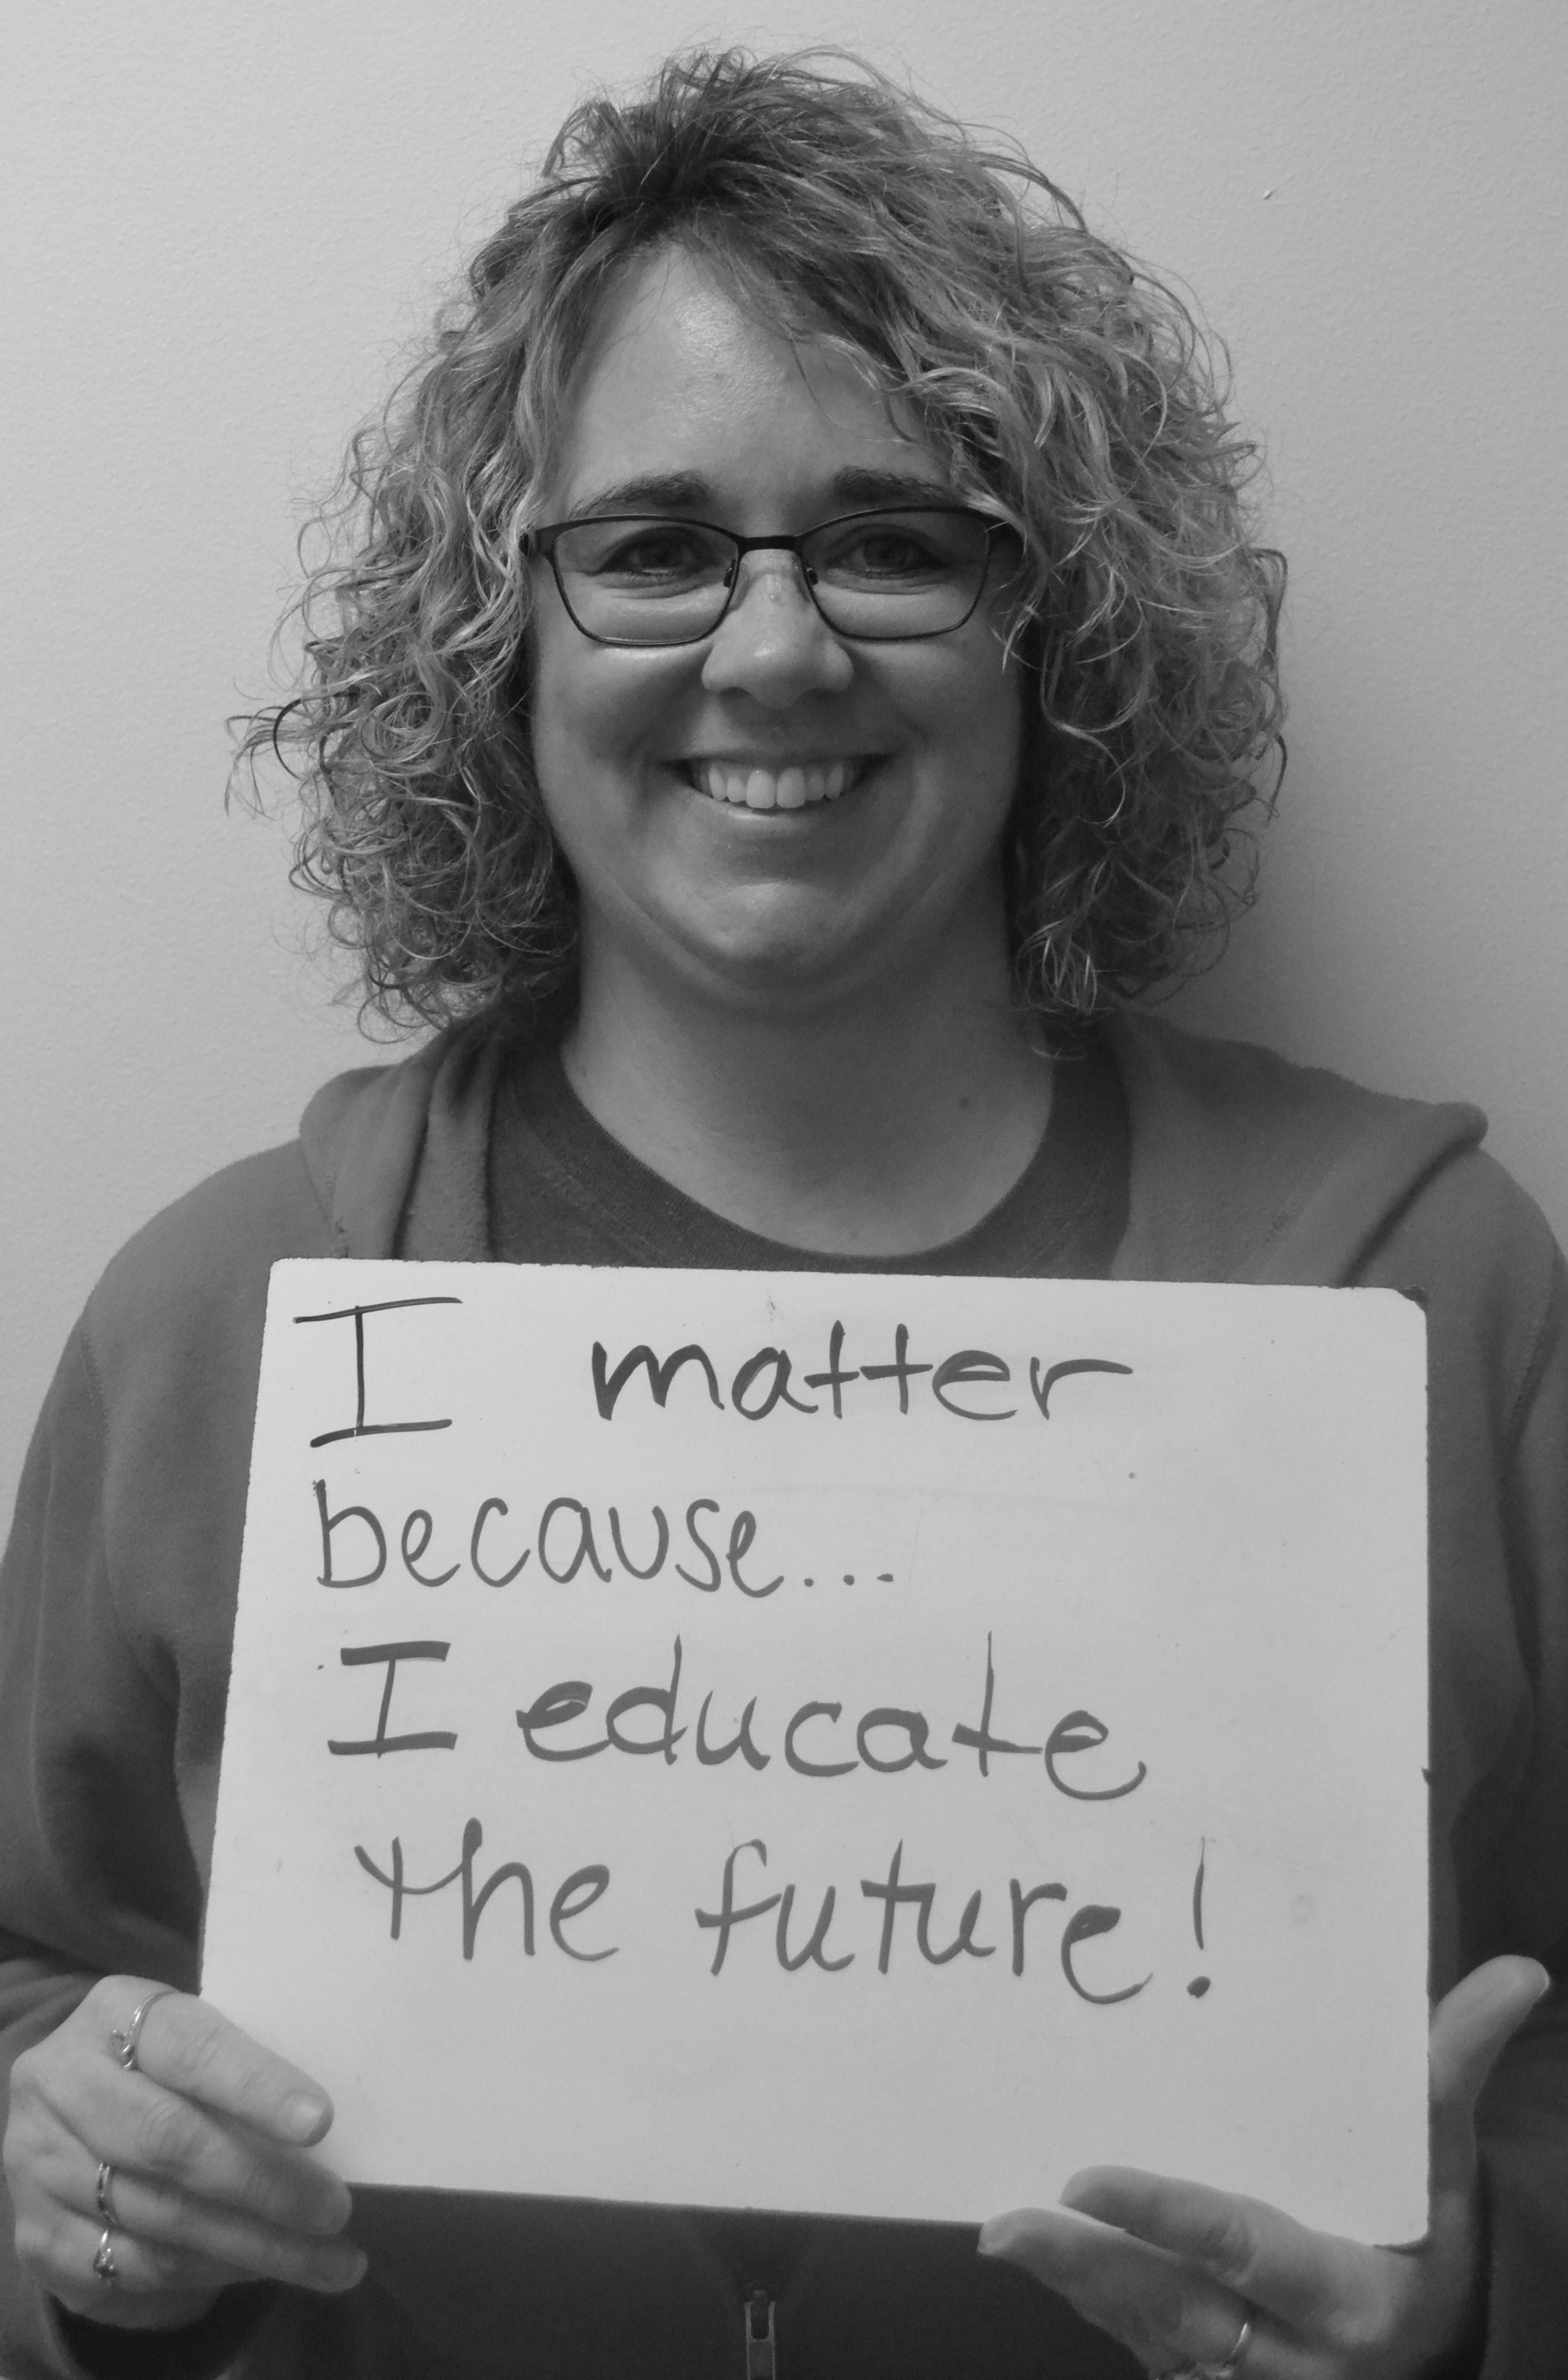 I matter because...I educate the future!